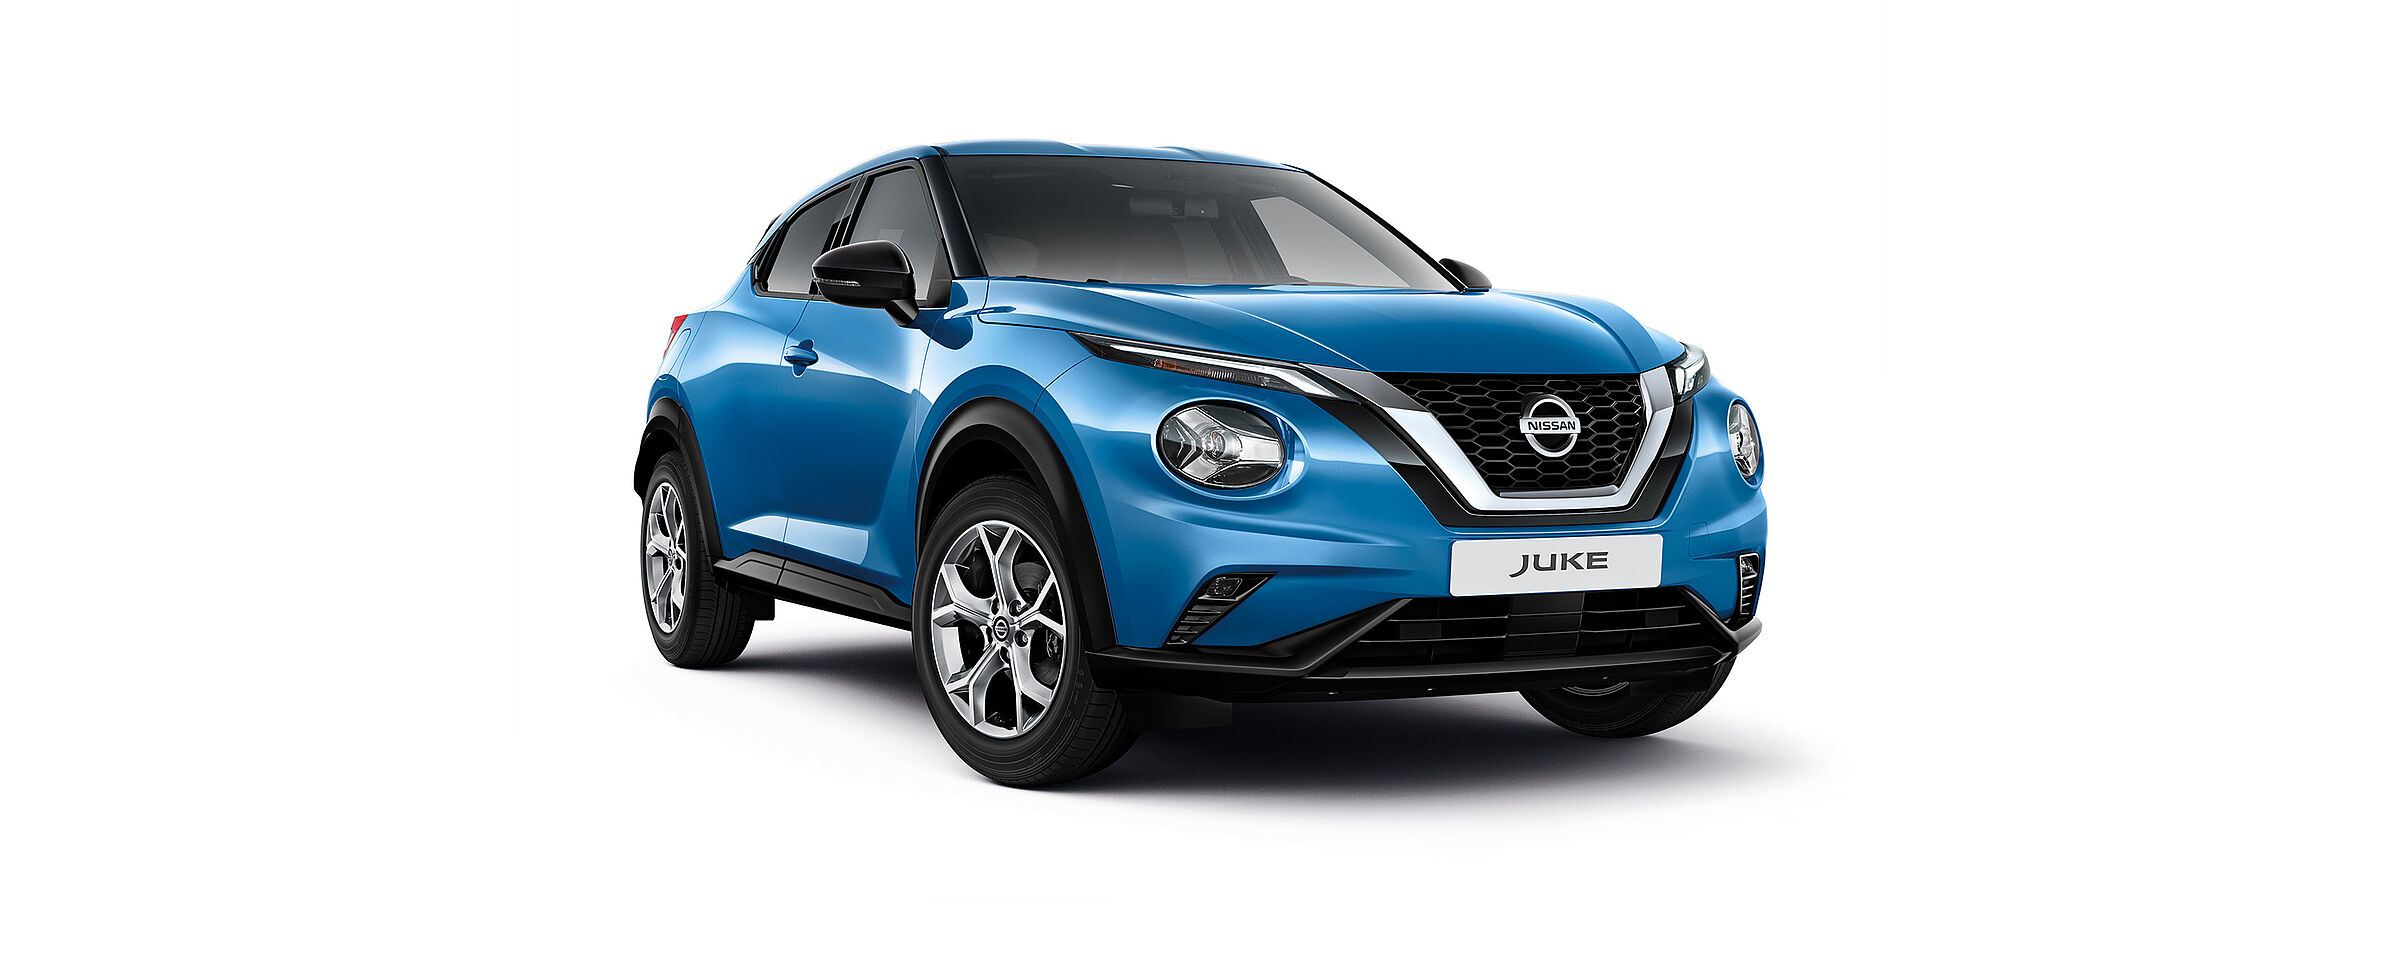 Nissan Juke Autozentrum P&A-Preckel